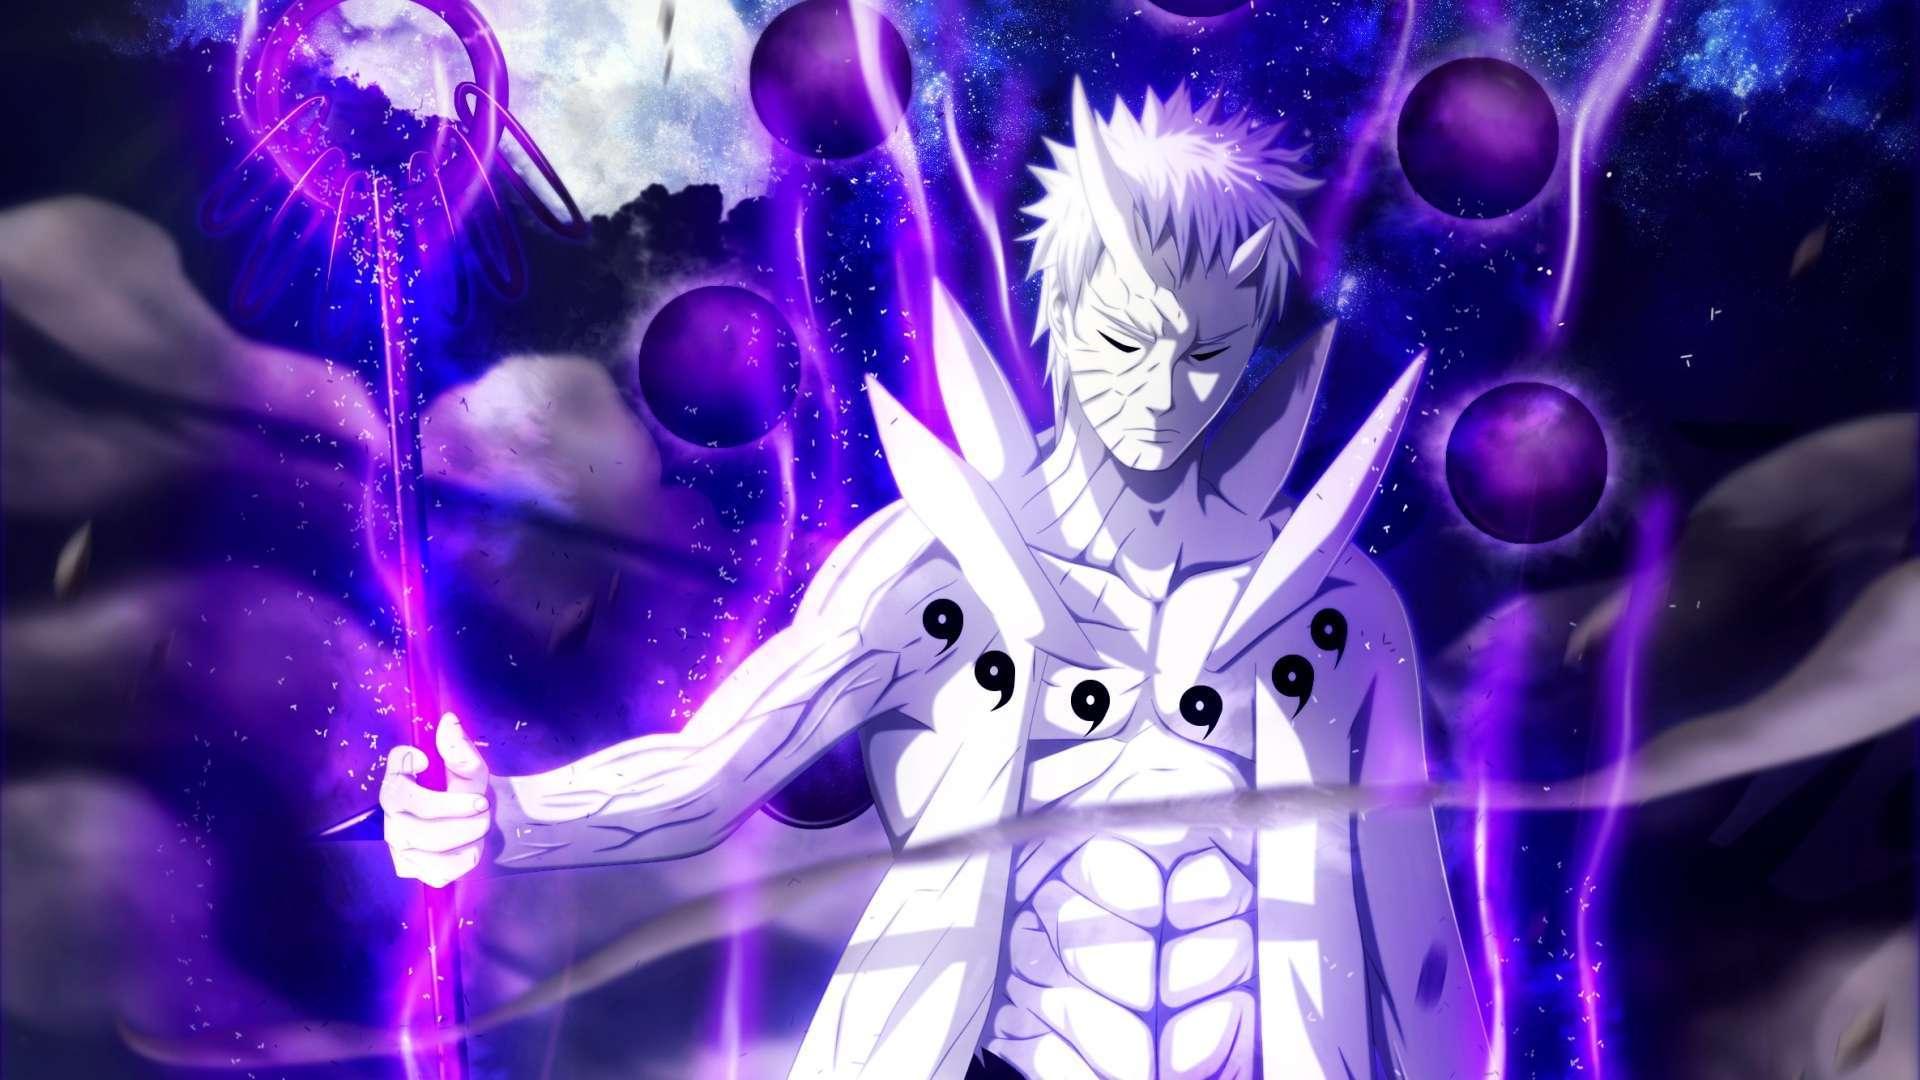 Download now Anime Naruto Tobi Uchiha Obito Desktop Wallpaper 1080p 1920x1080